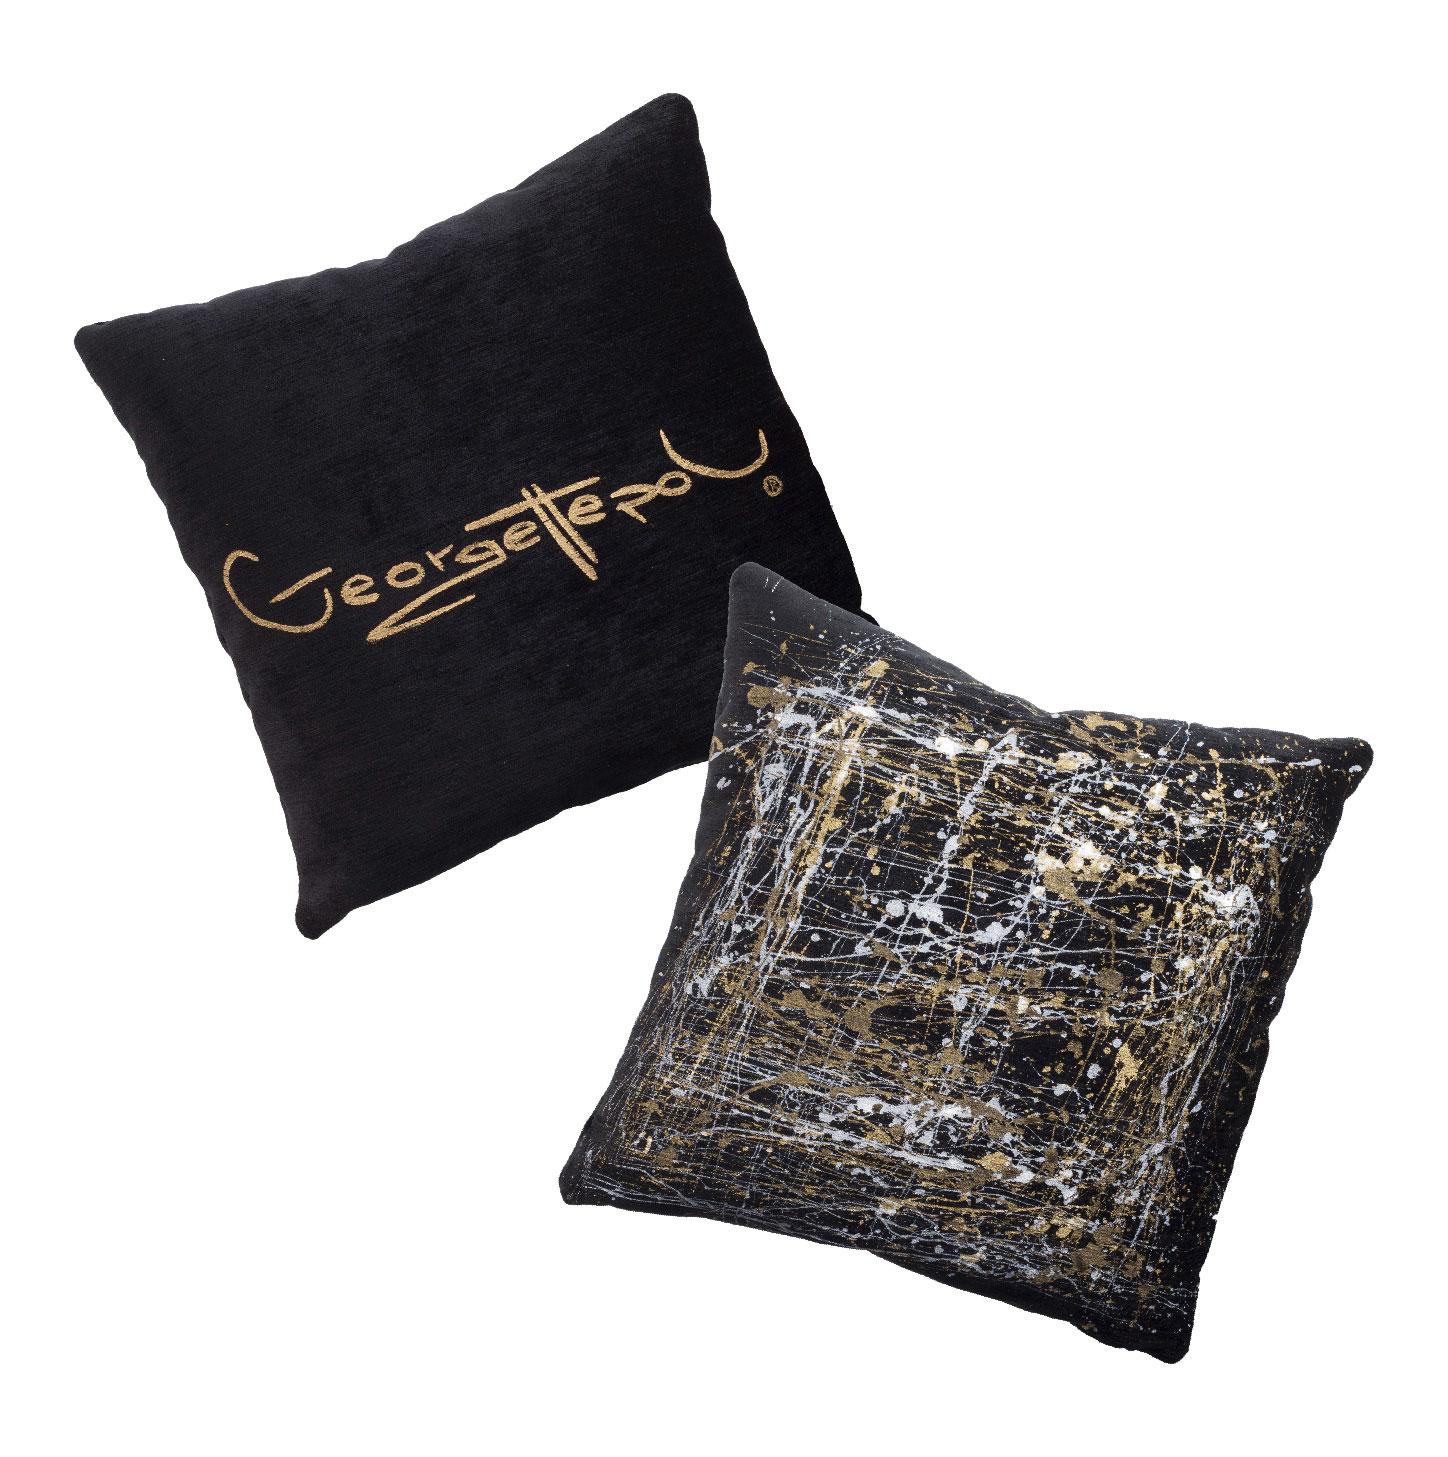 Cuscini Oro.Duo Di Cuscini Oro Rollmat By Georgettepol Georgettepol